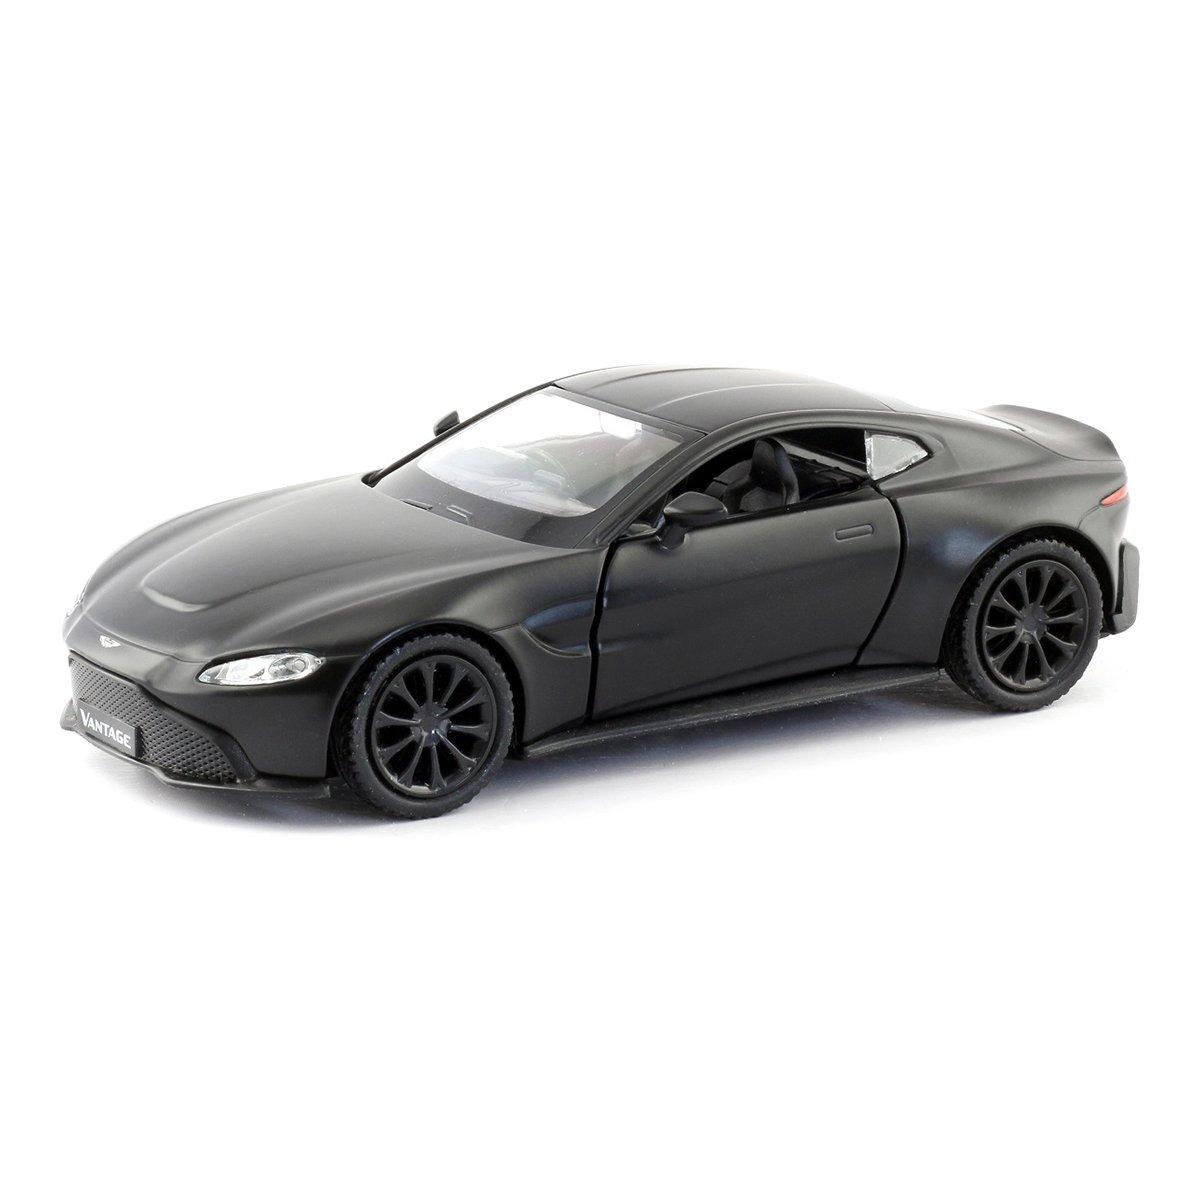 Автомодель RMZ City Aston Martin Vantage 2018 Black 554044М ТМ: RMZ City